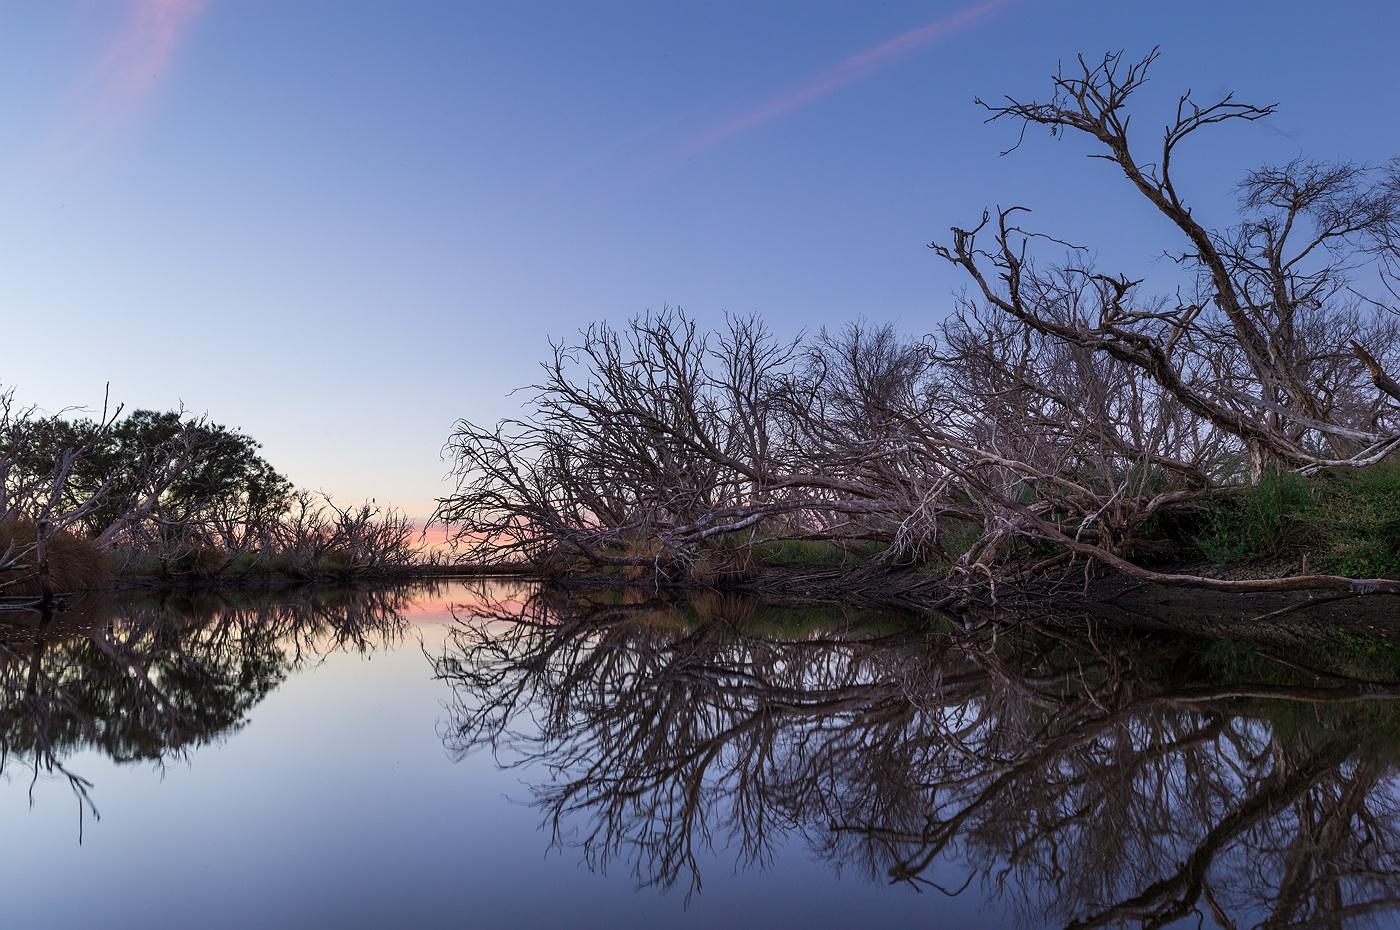 harvey_river_landscape_photography_02